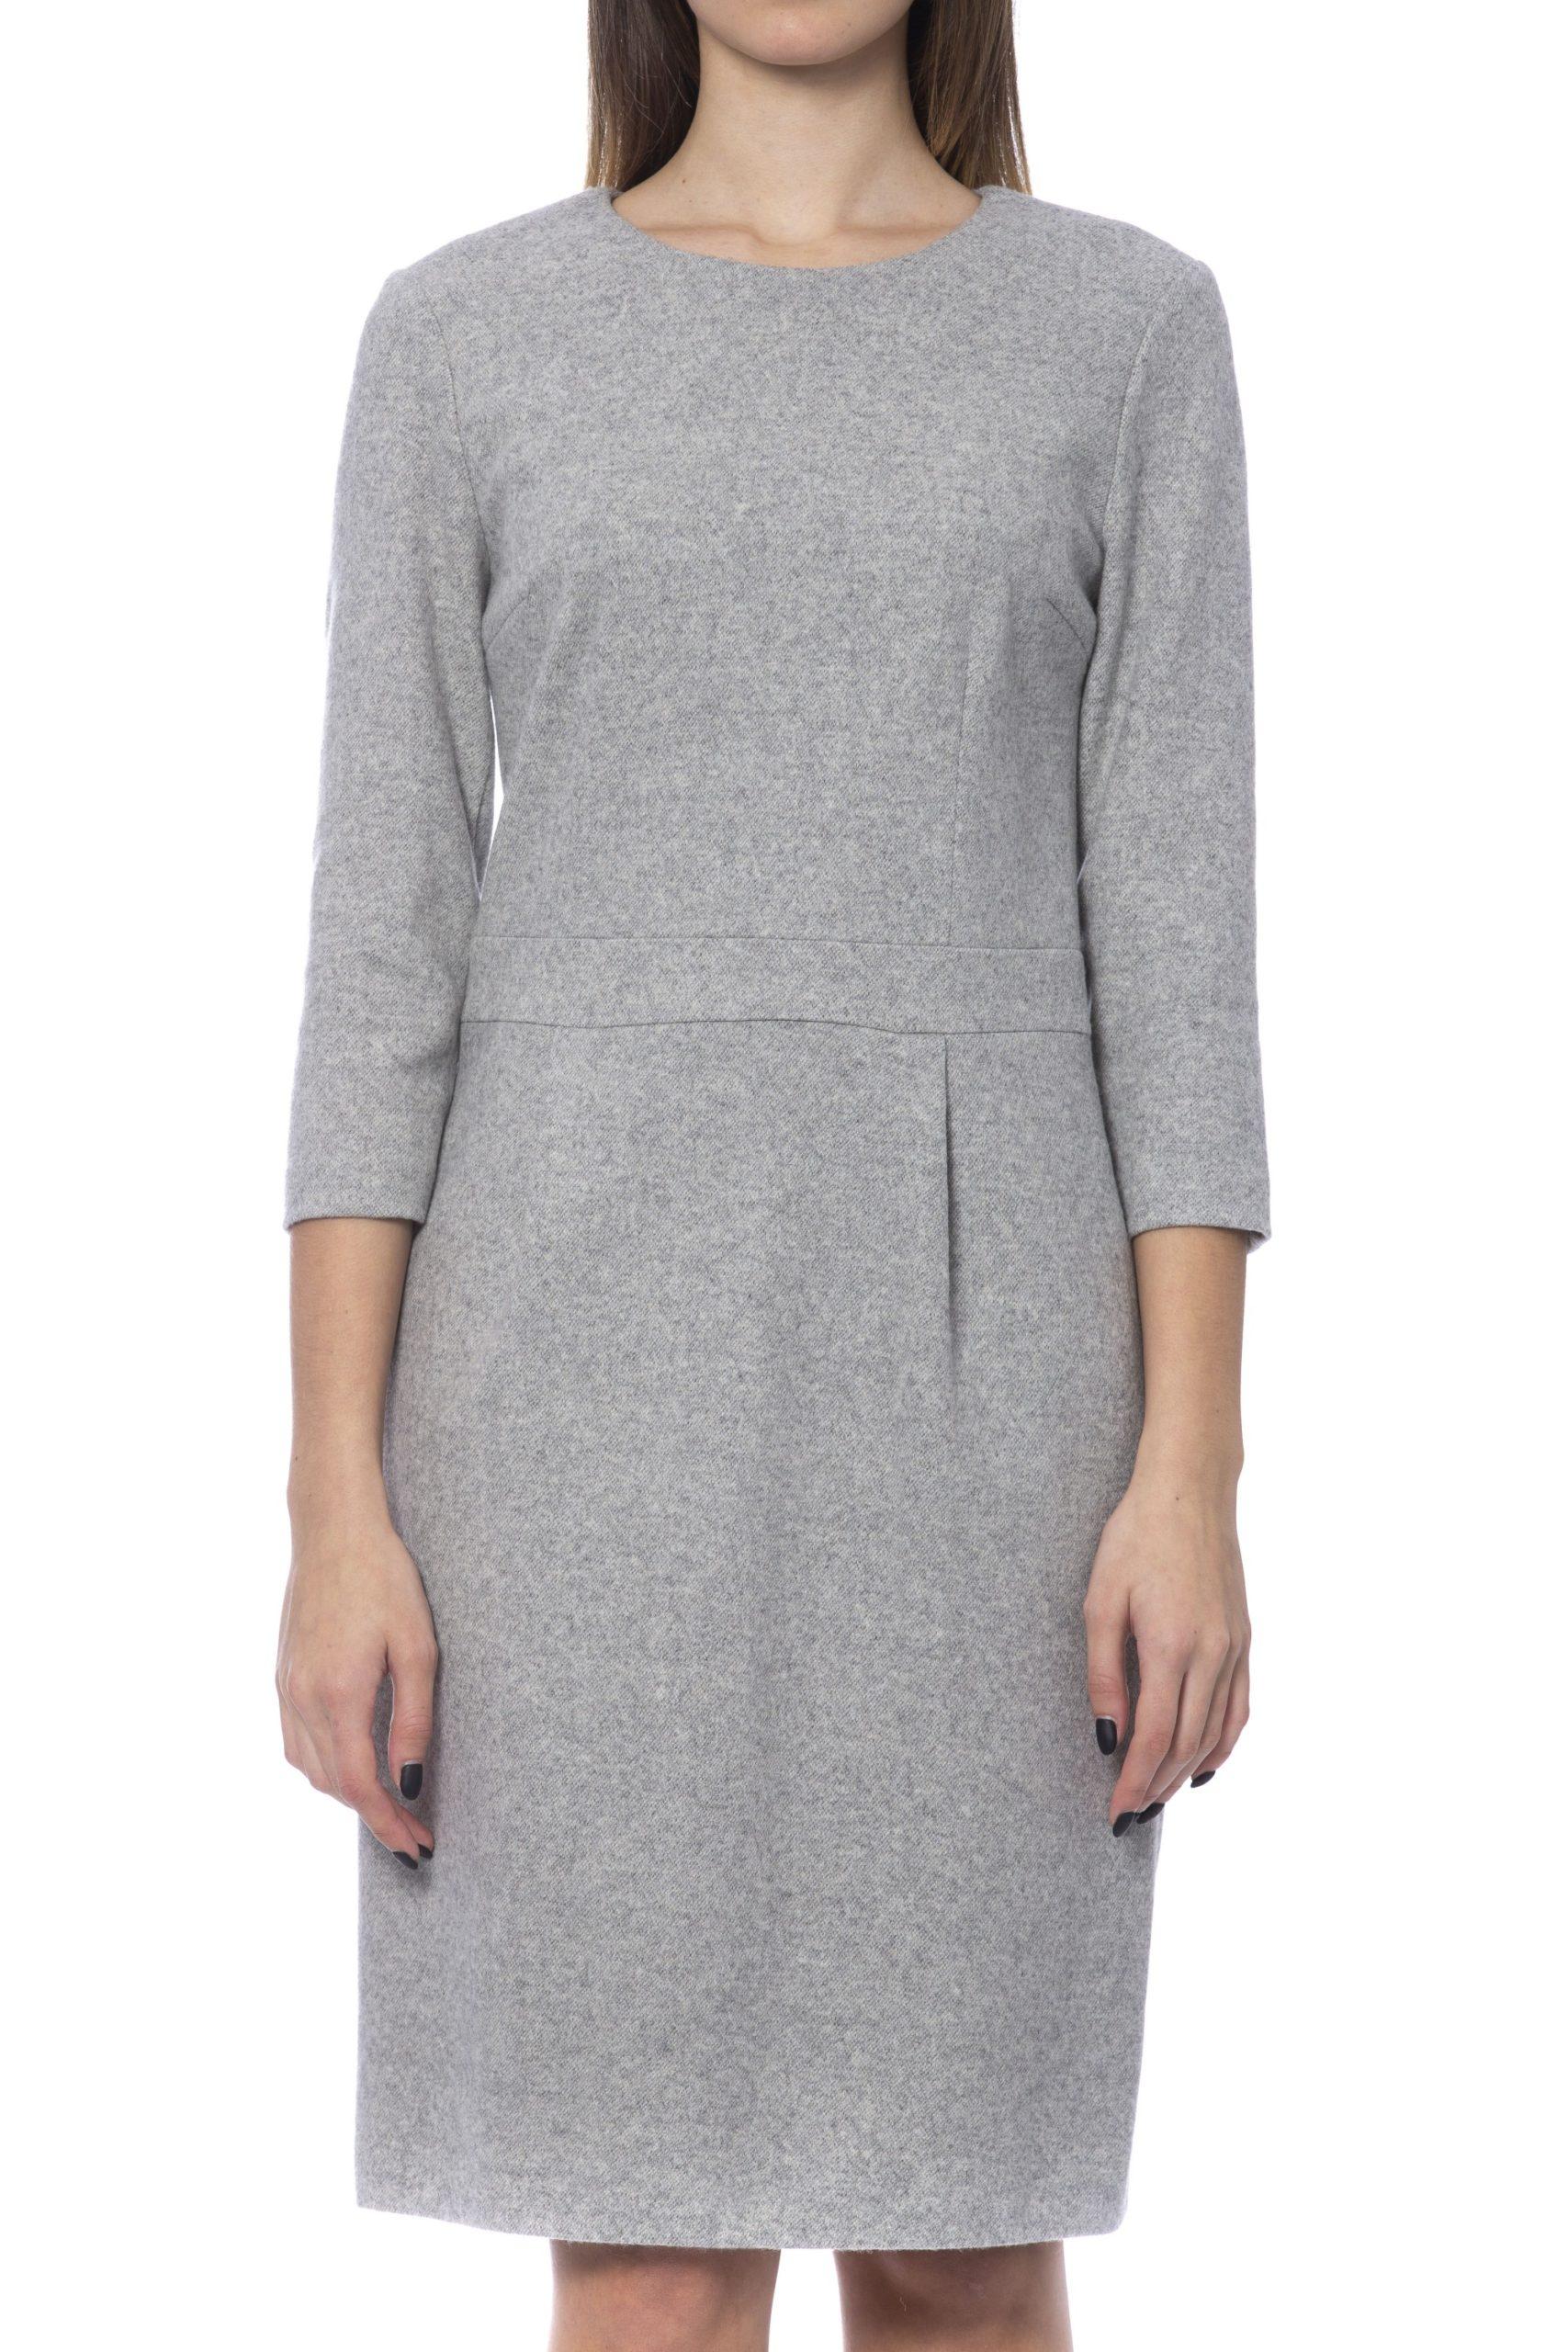 Peserico Women's Dress Grey PE992074 - IT42 | S